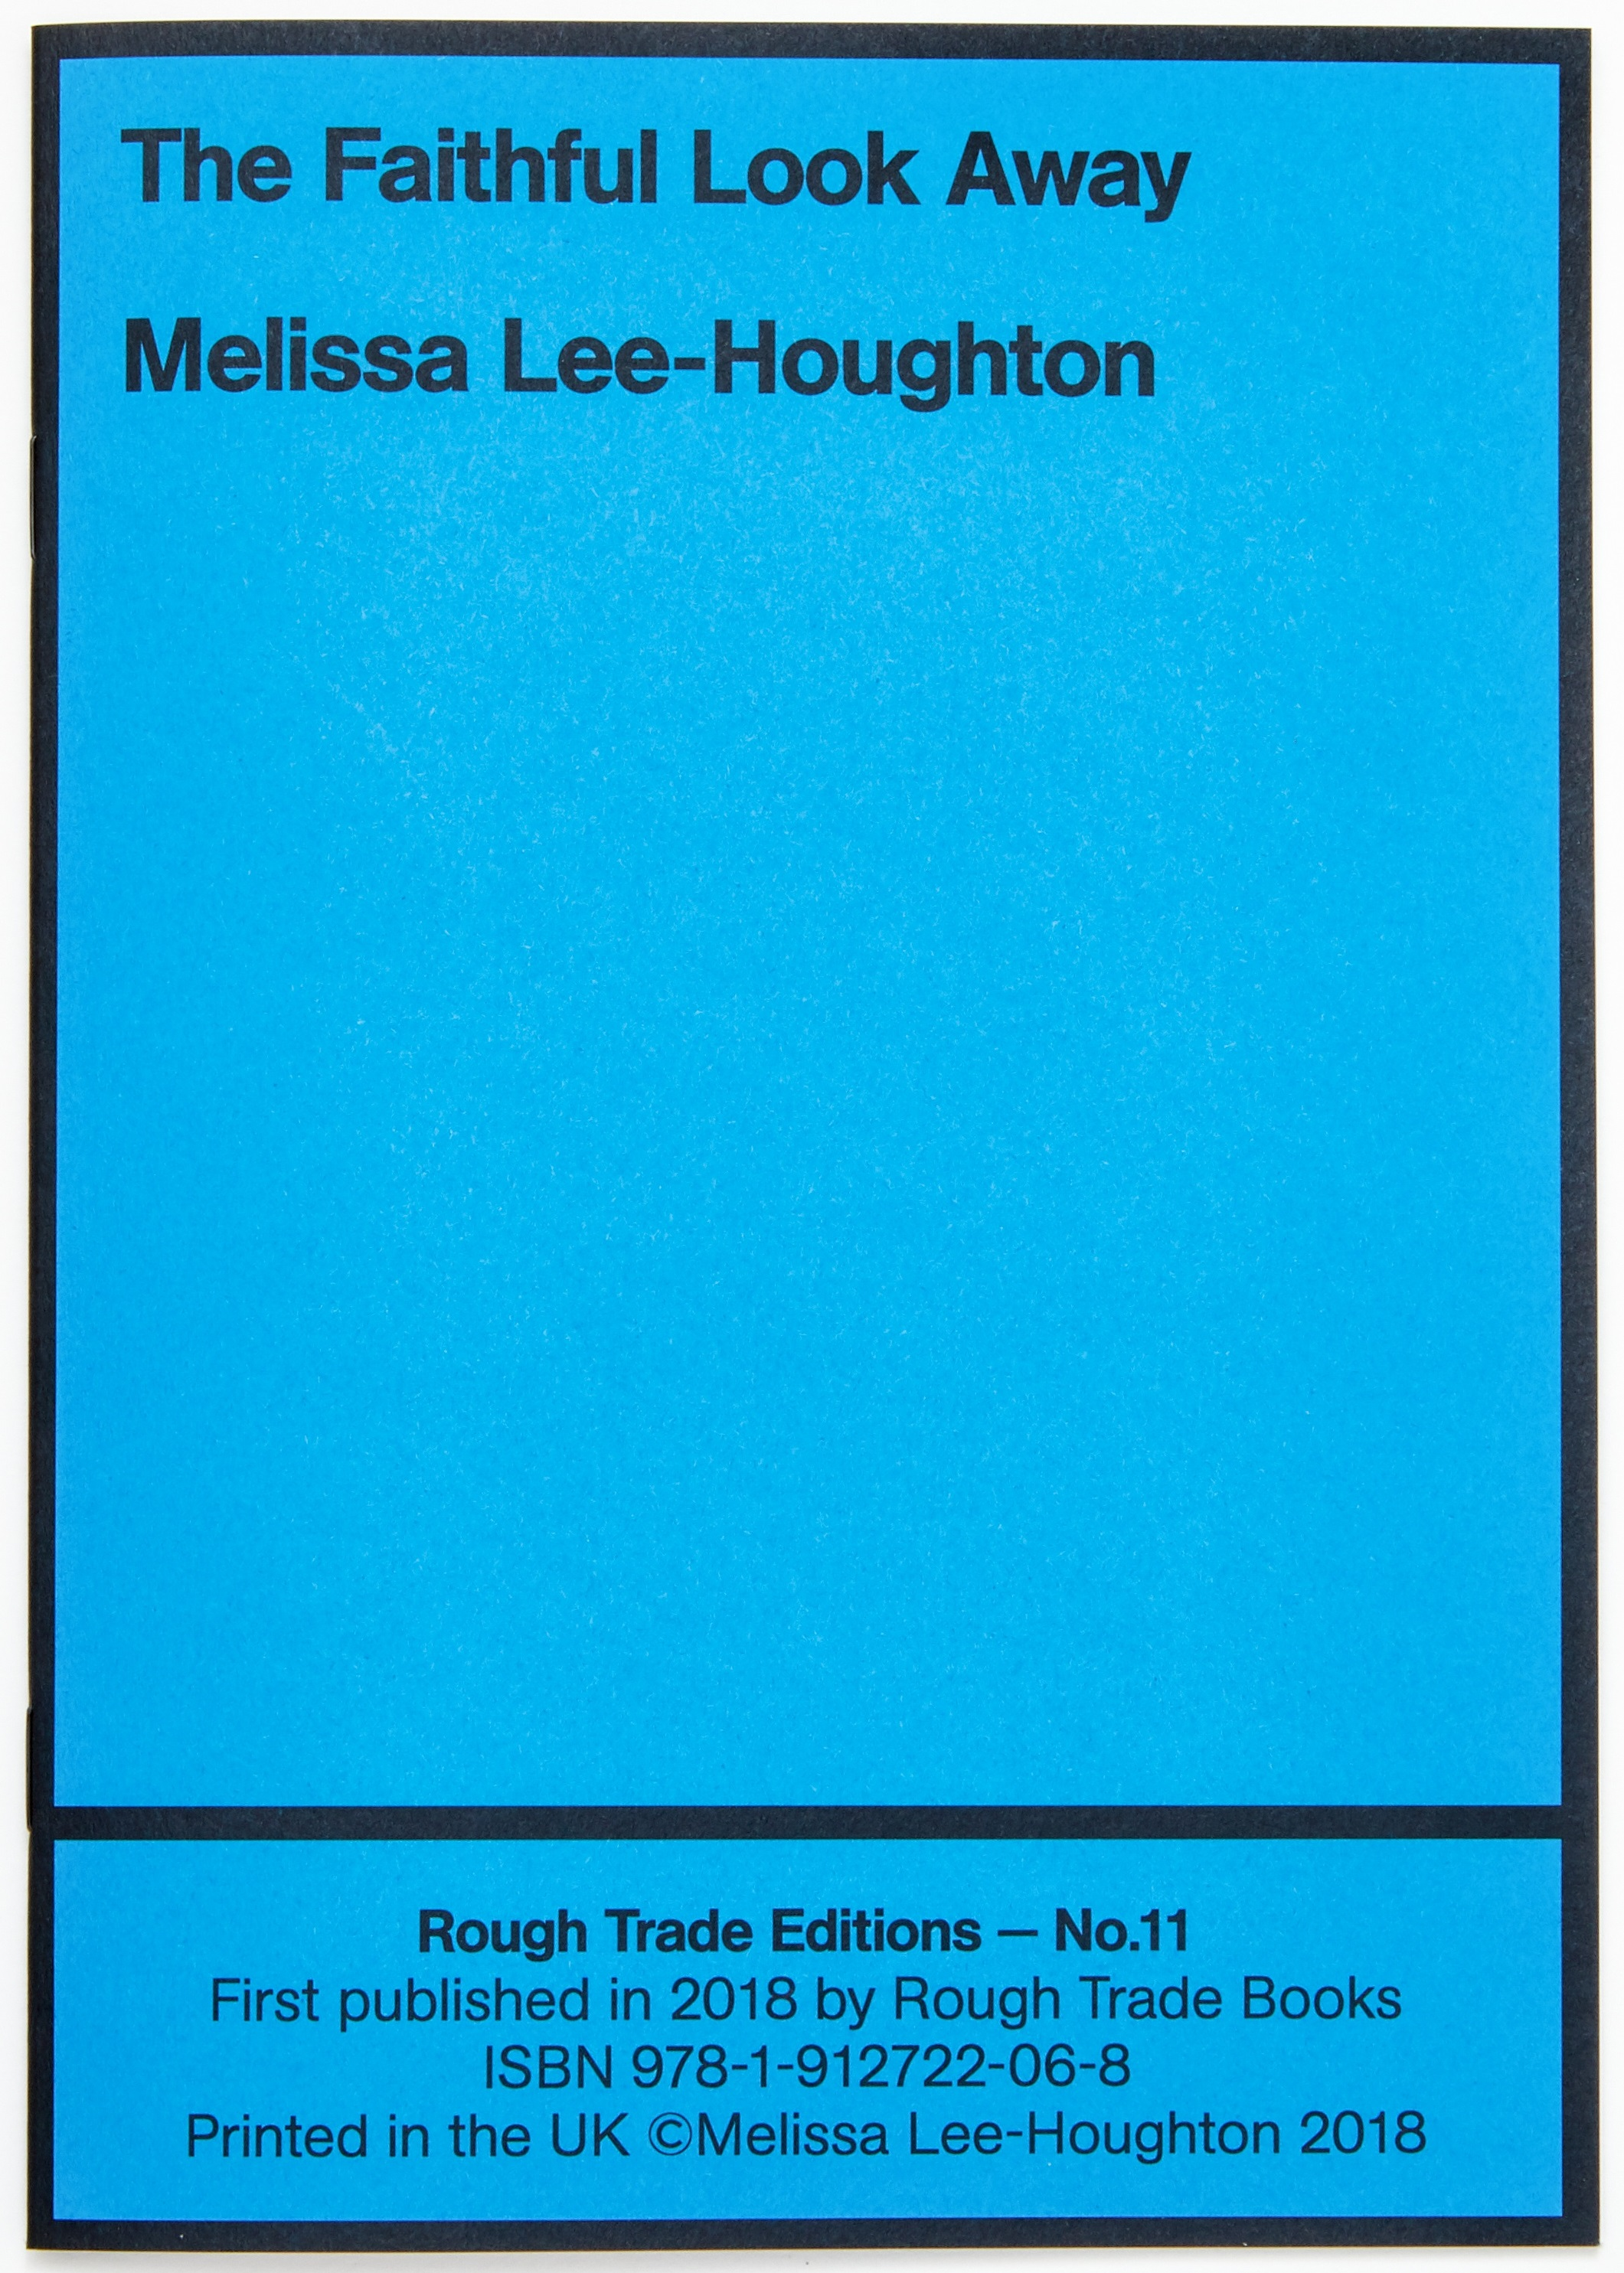 Slikovni rezultat za Melissa Lee-Houghton, The Faithful Look Away,